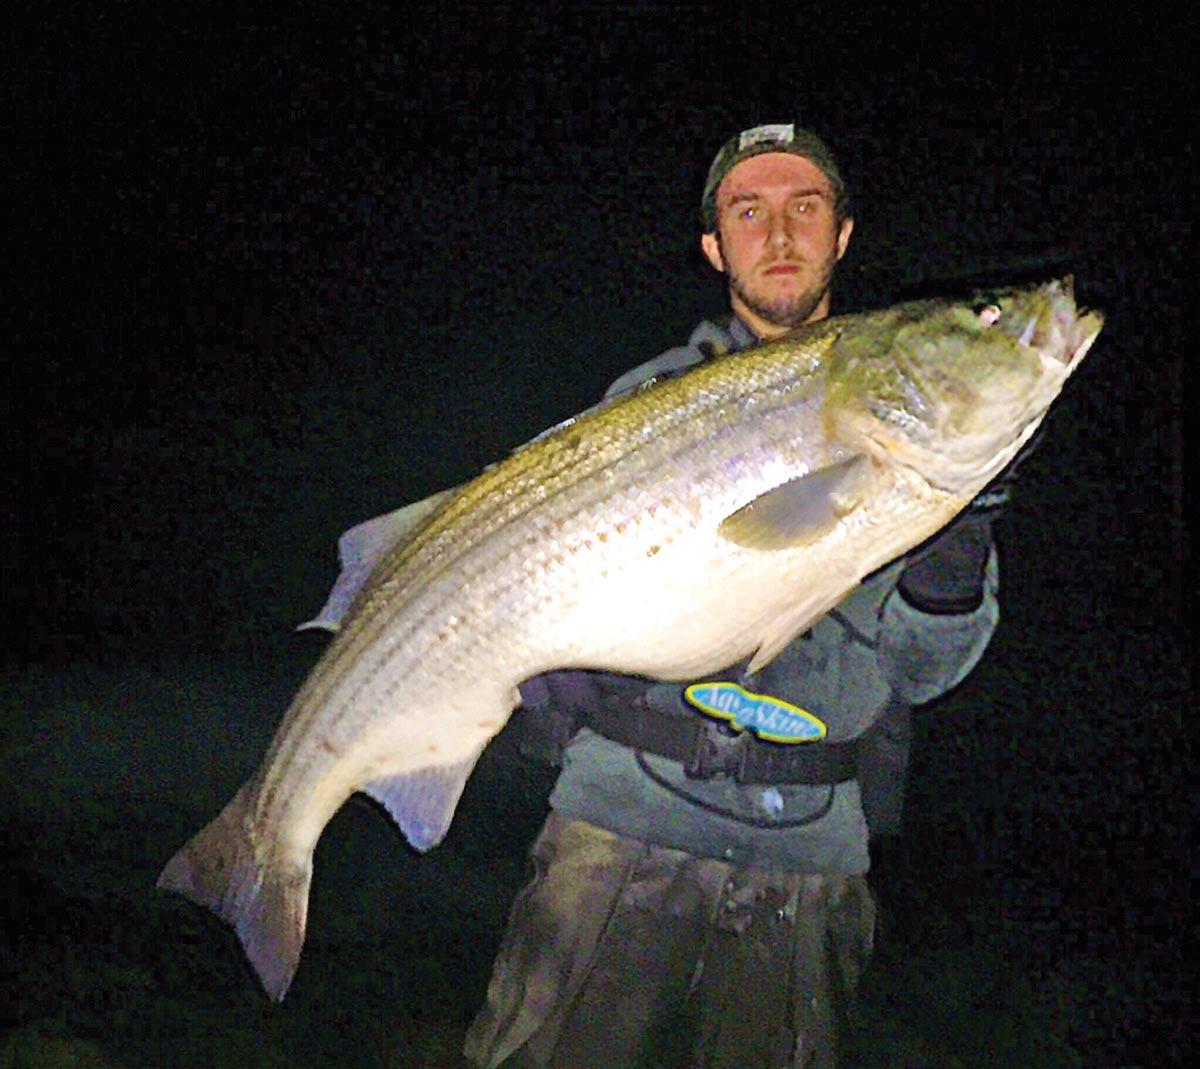 Matt Broderick holding a huge fish caught at night